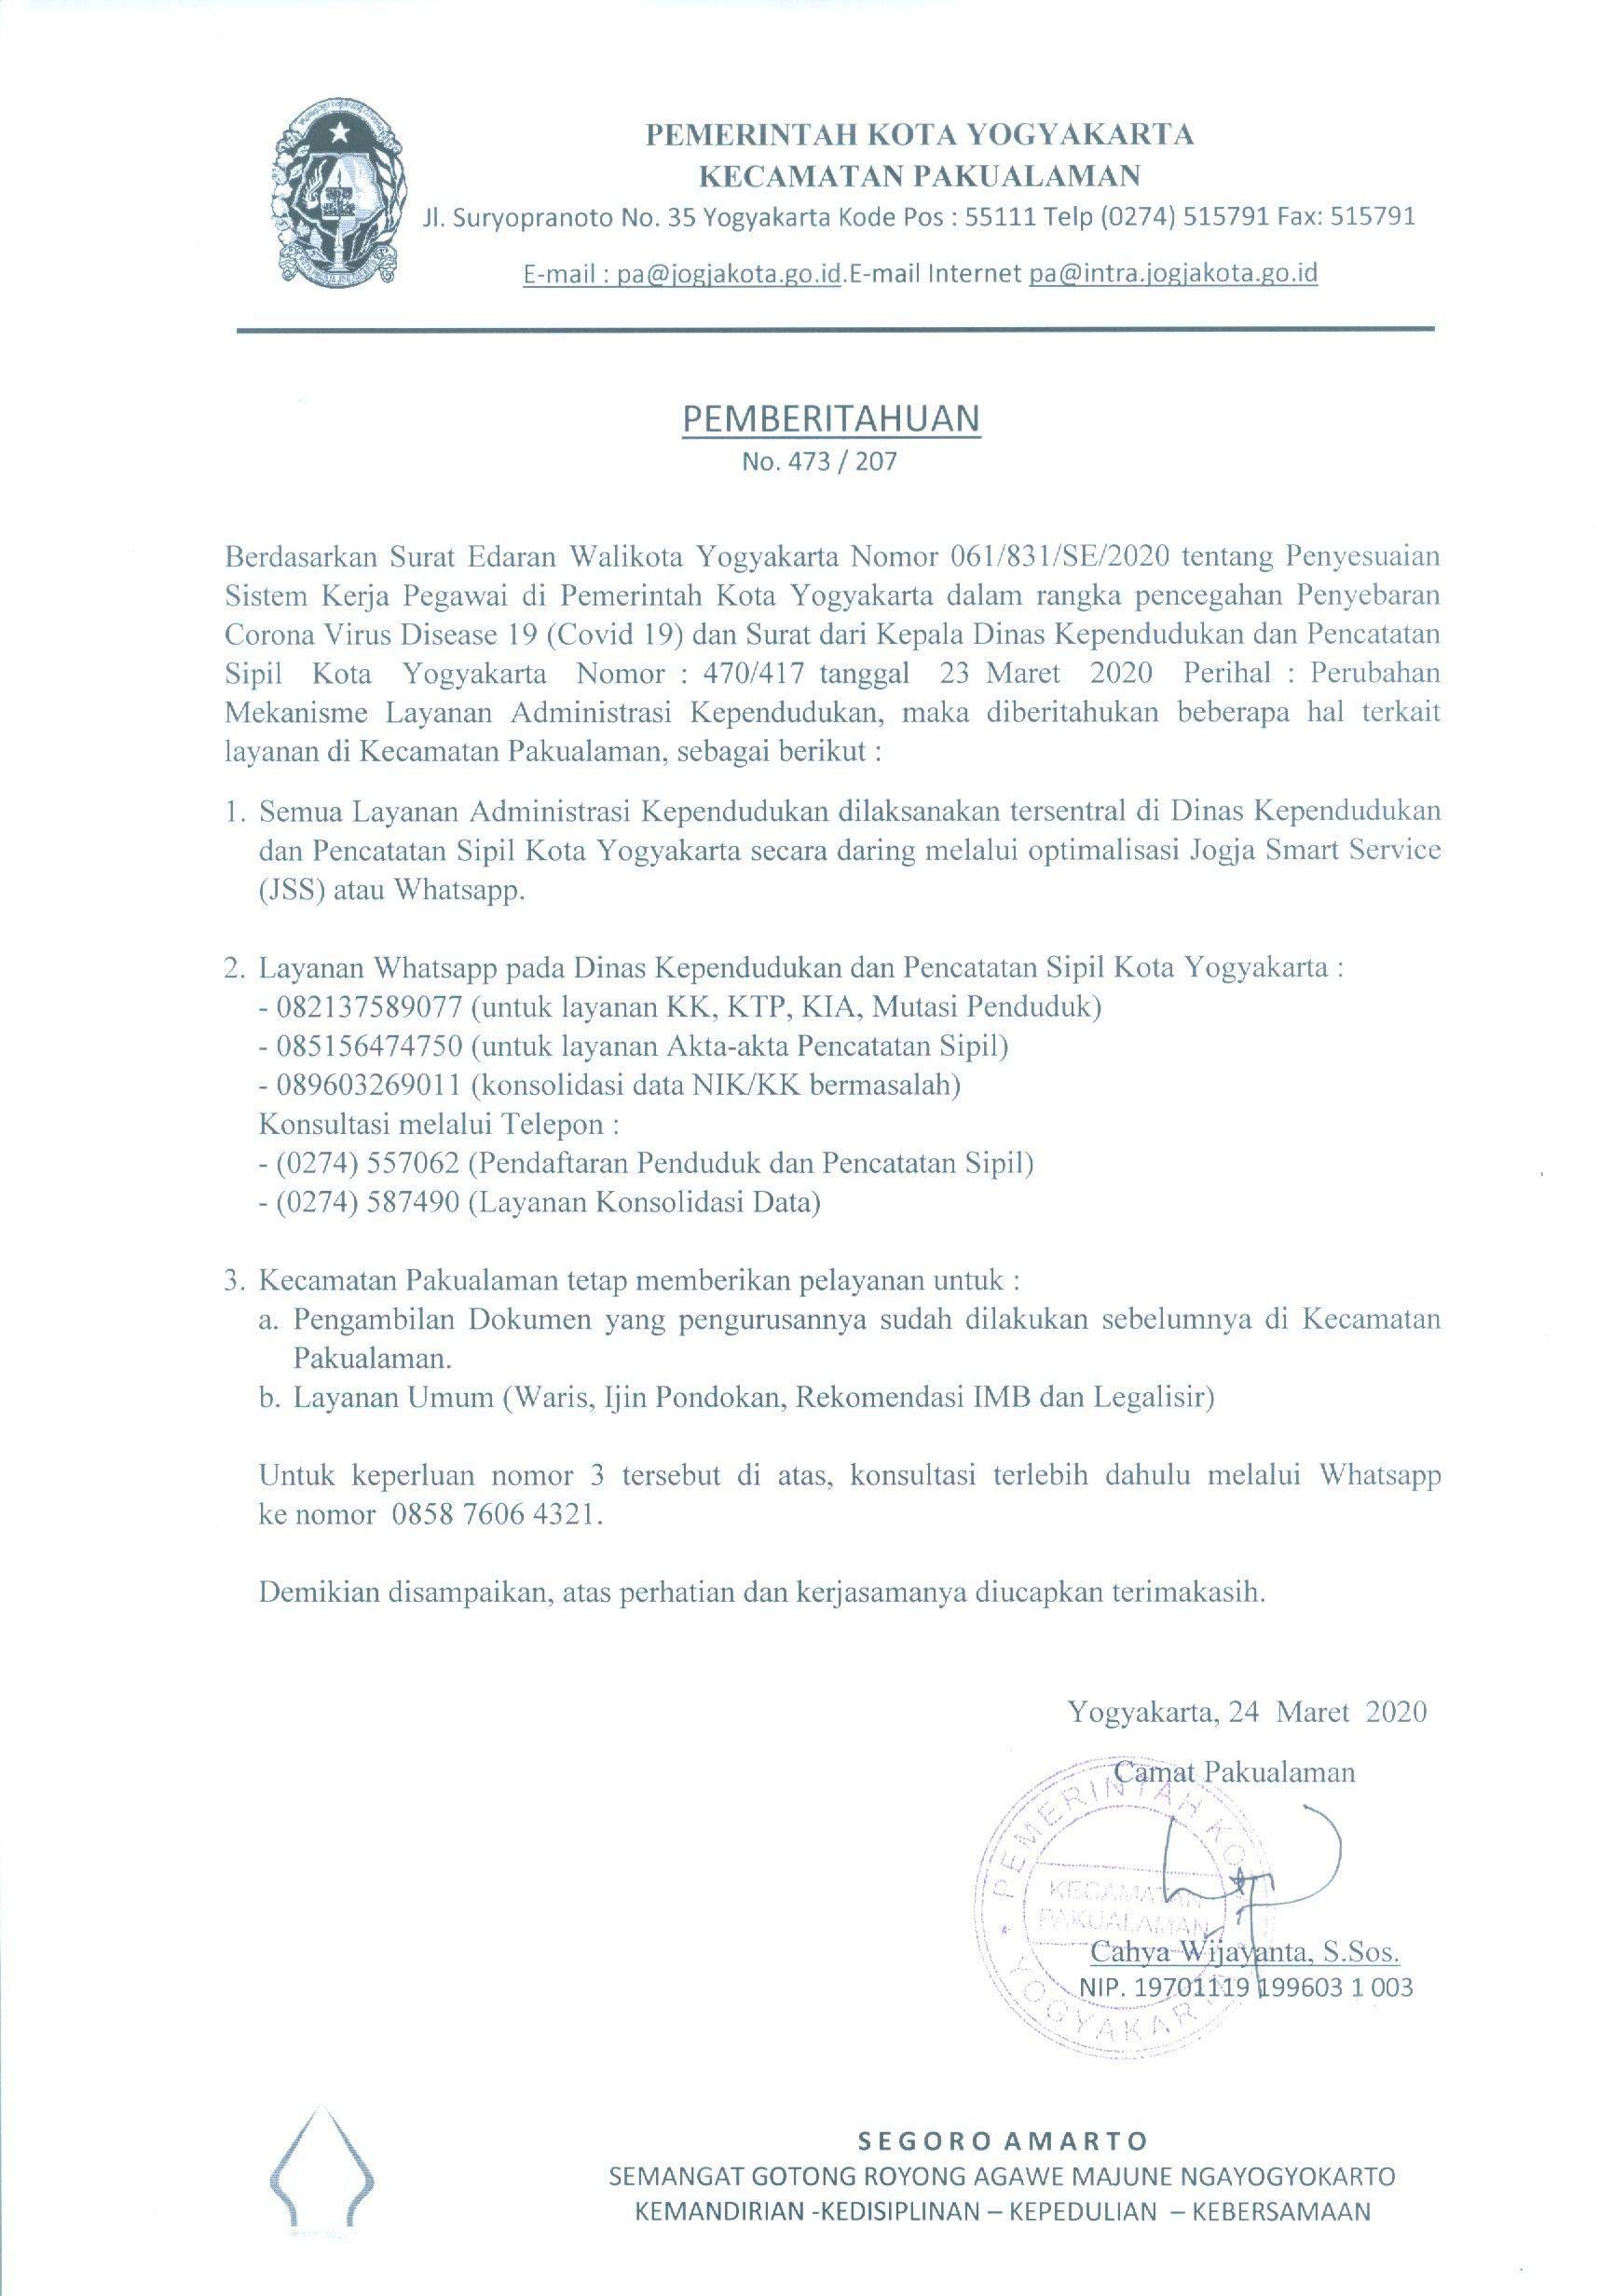 Perubahan mekanisme Pelayanan Pada Masa Tanggap Darurat Bencana COVID-19